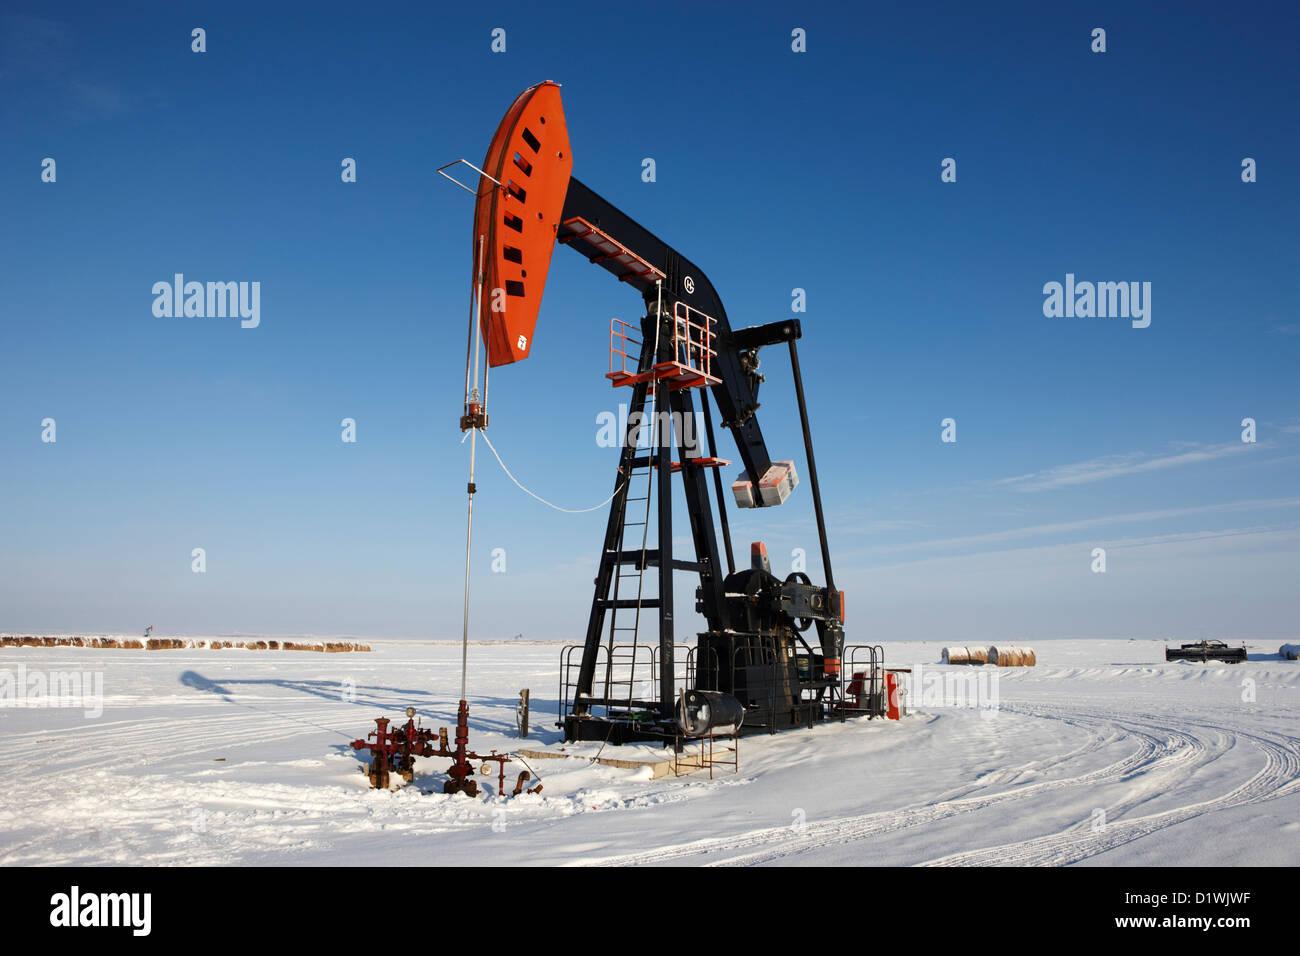 Öl-Bohrschwengels im Winter vergessen Saskatchewan Kanada Stockbild